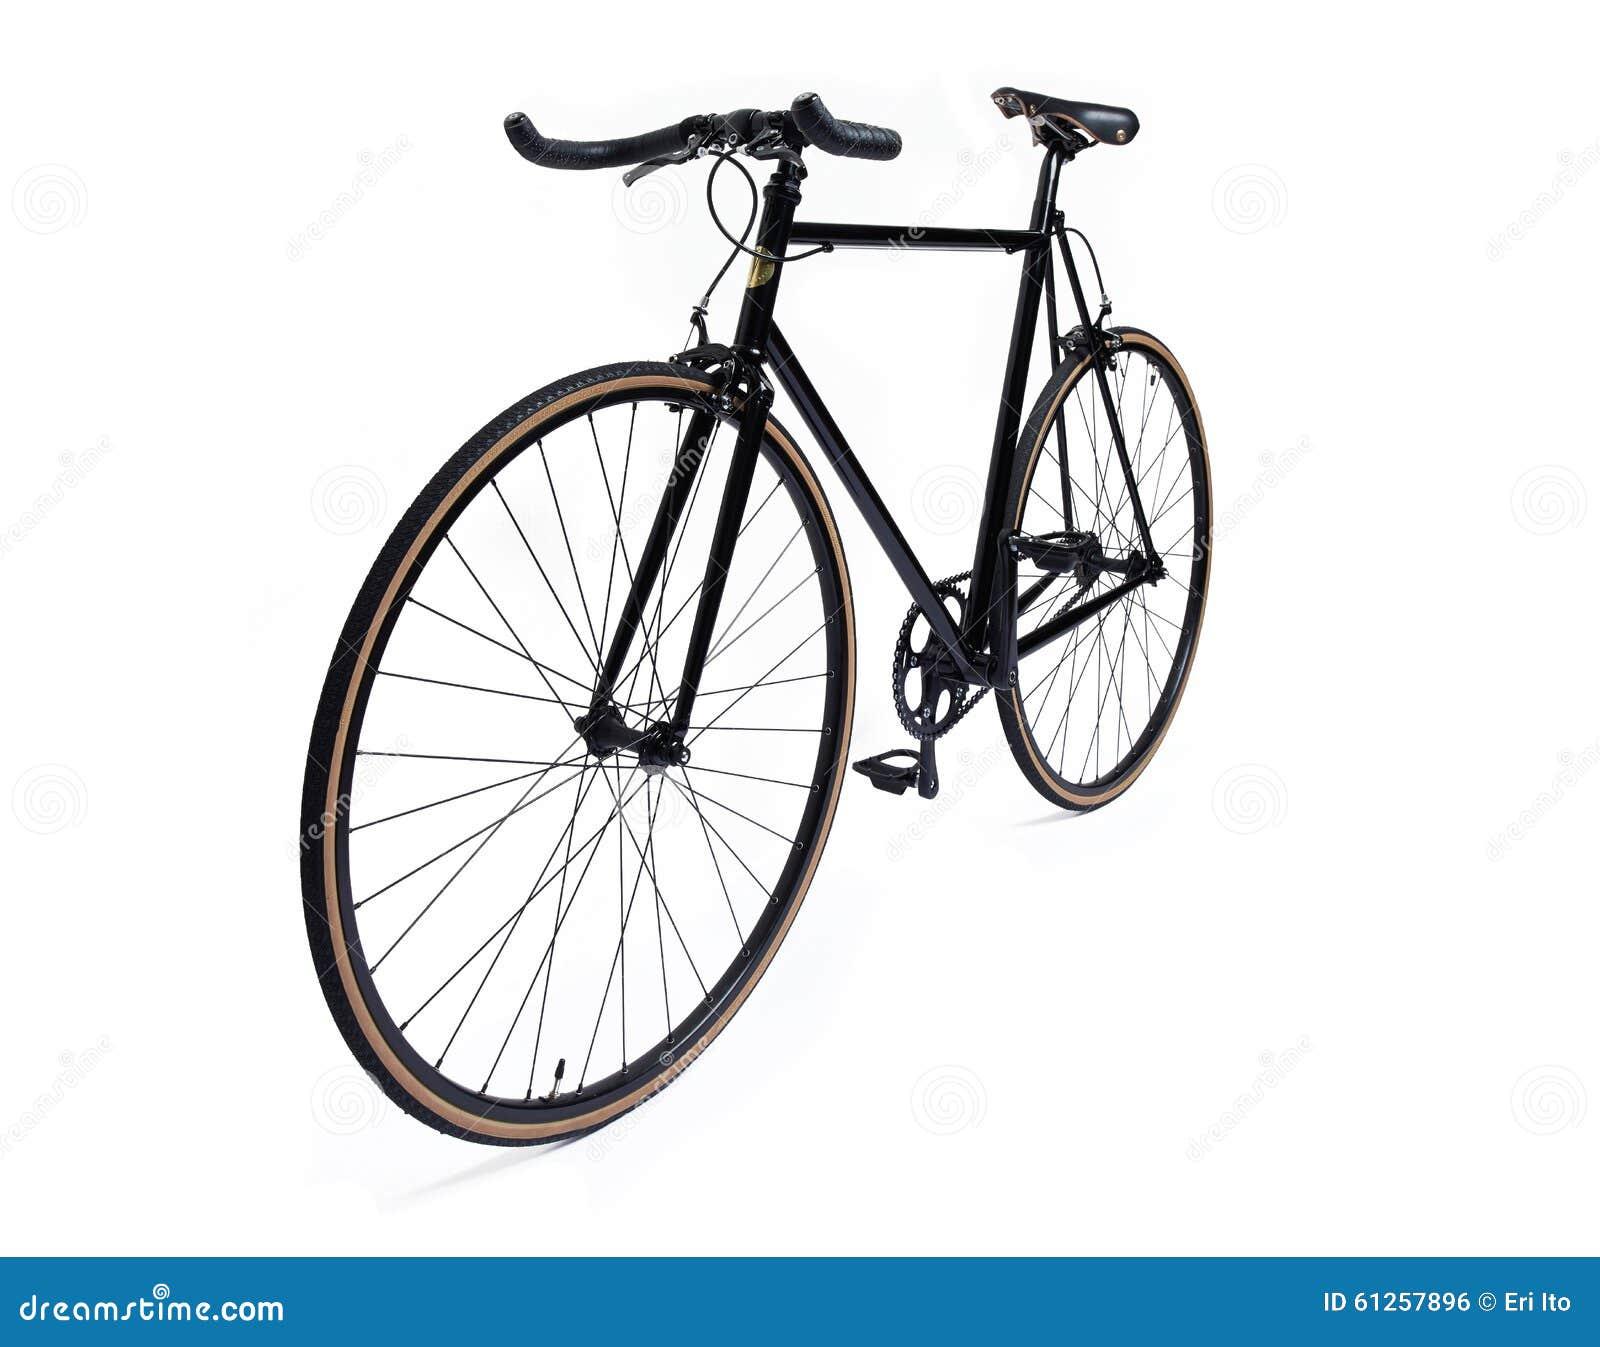 Bicicleta fija negra del engranaje